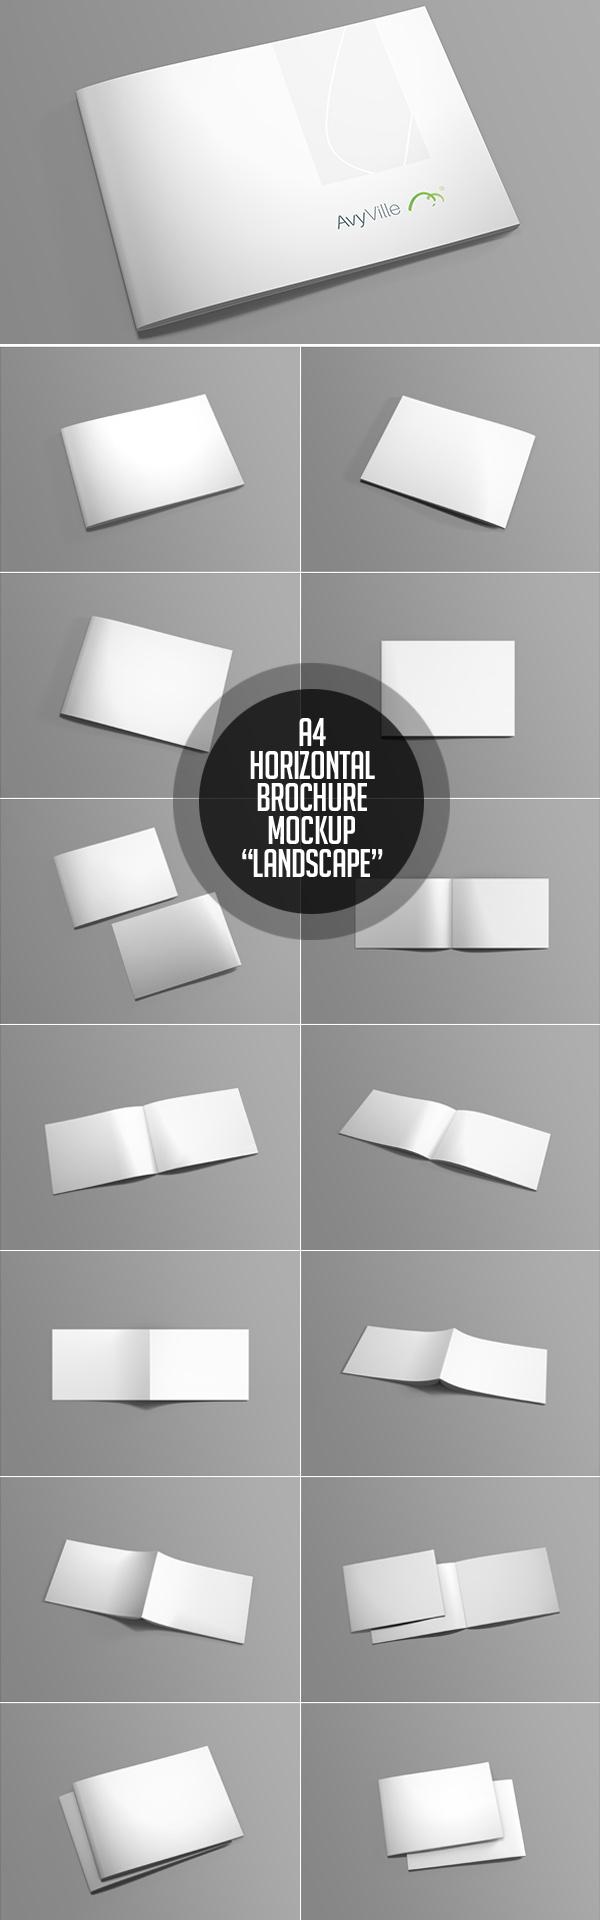 Free Landscape Brochure PSD Mockup